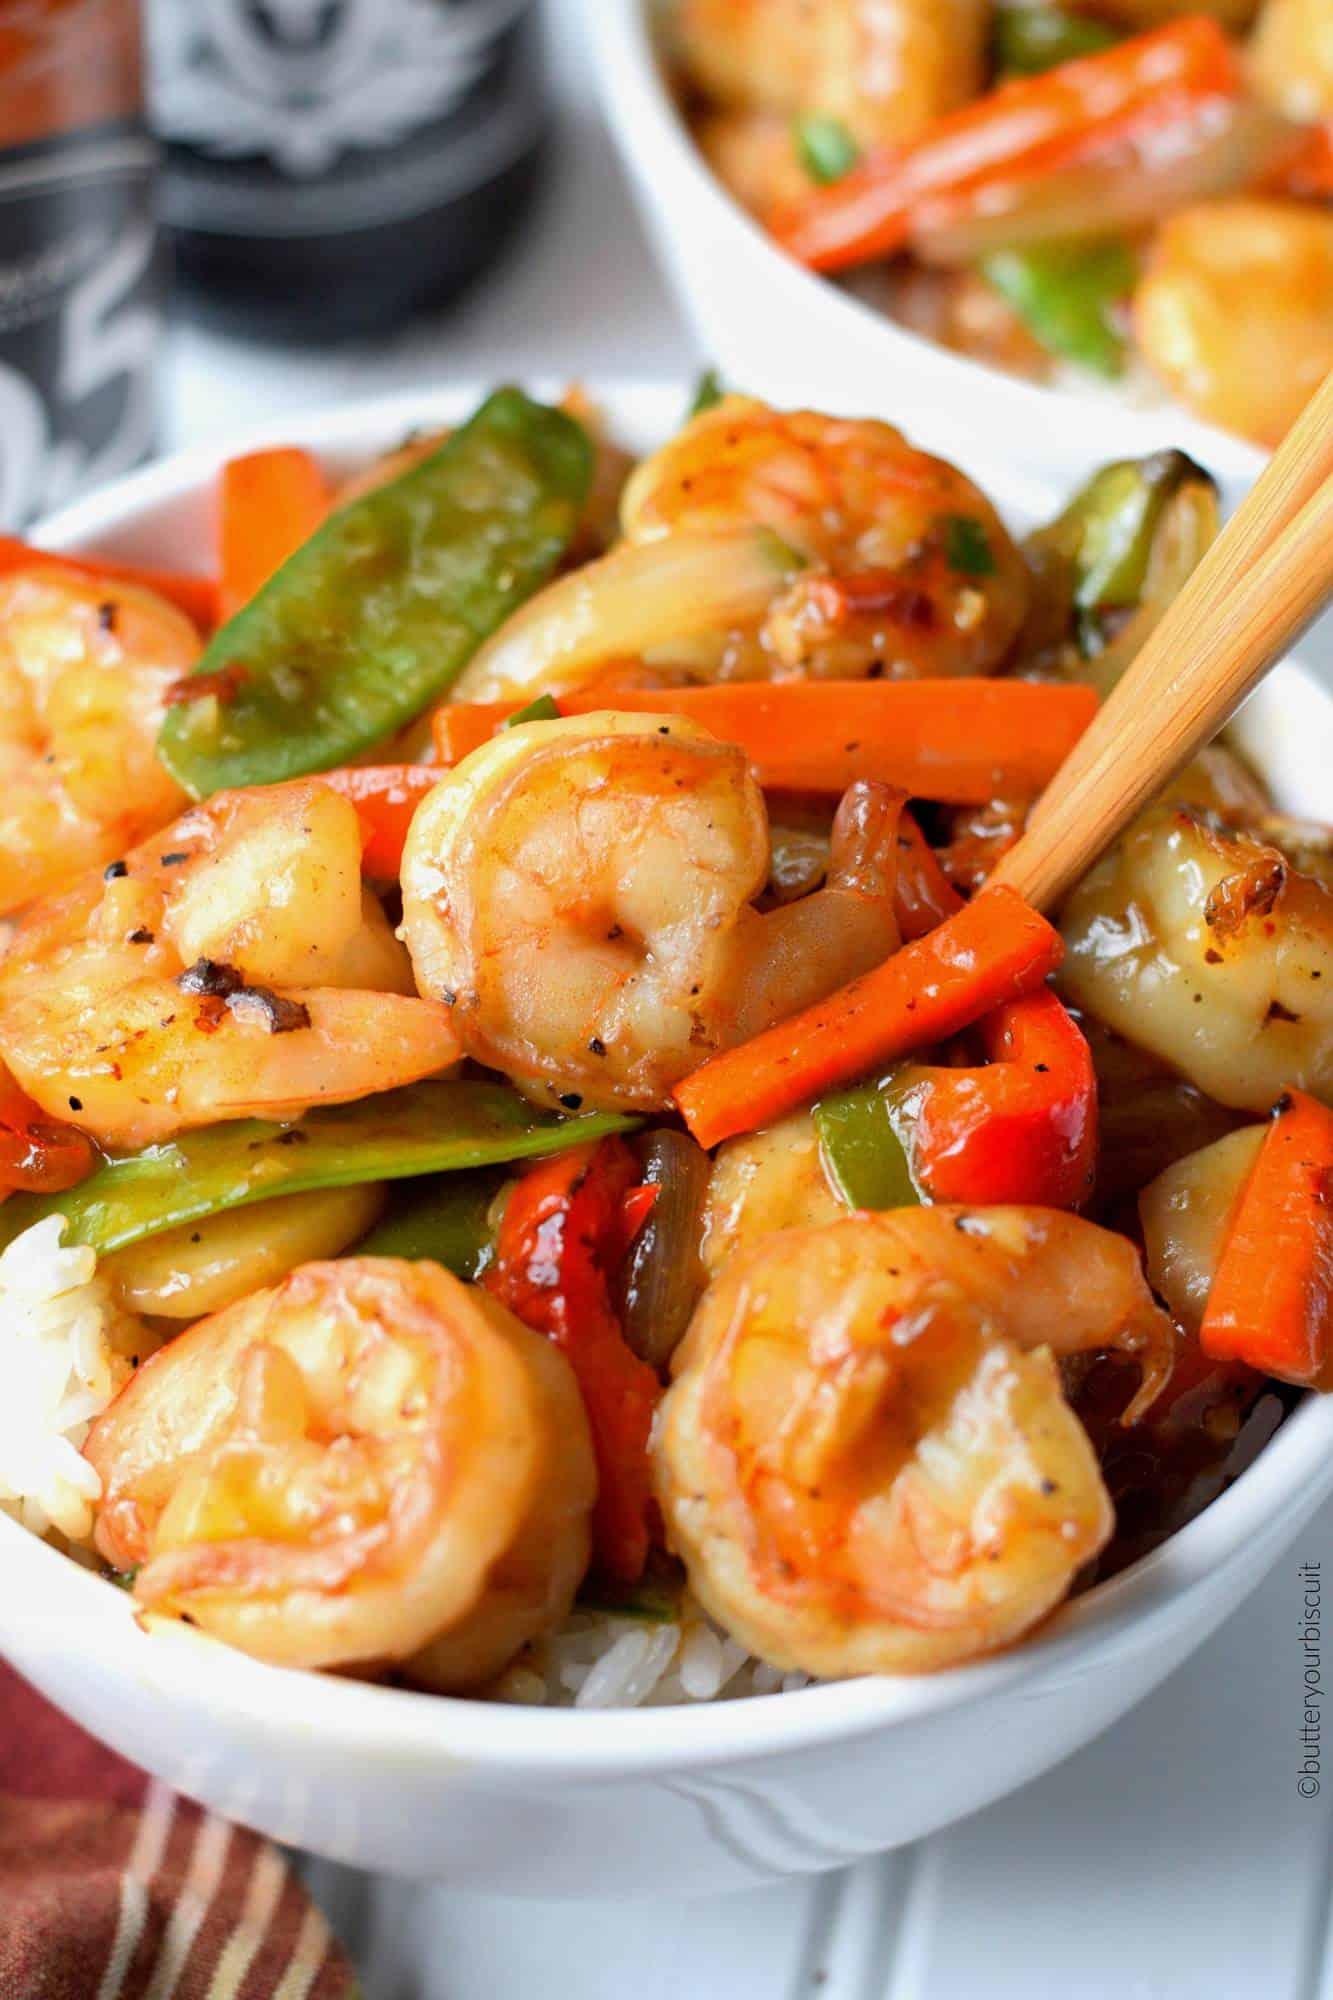 Watch Shrimp with Sugar Snap Peas video